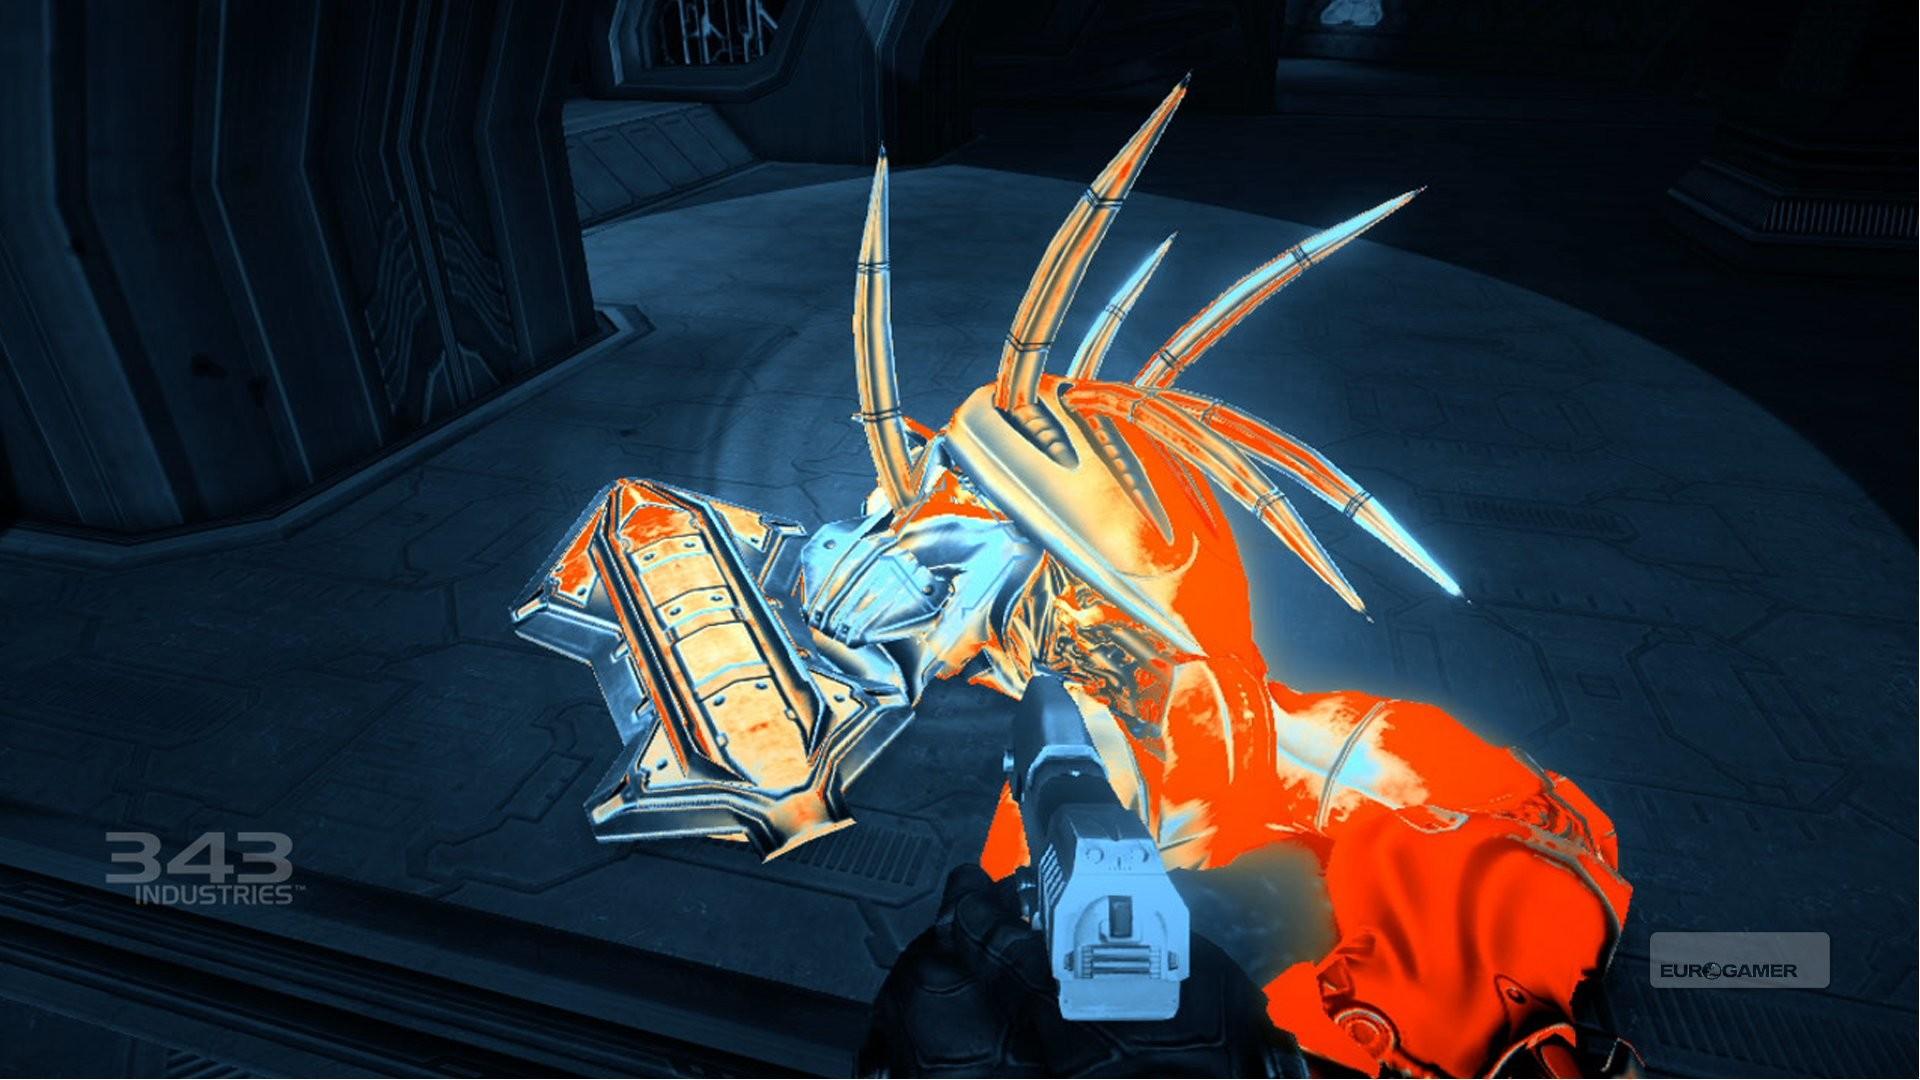 Halo combat evolved anniversary pc download free